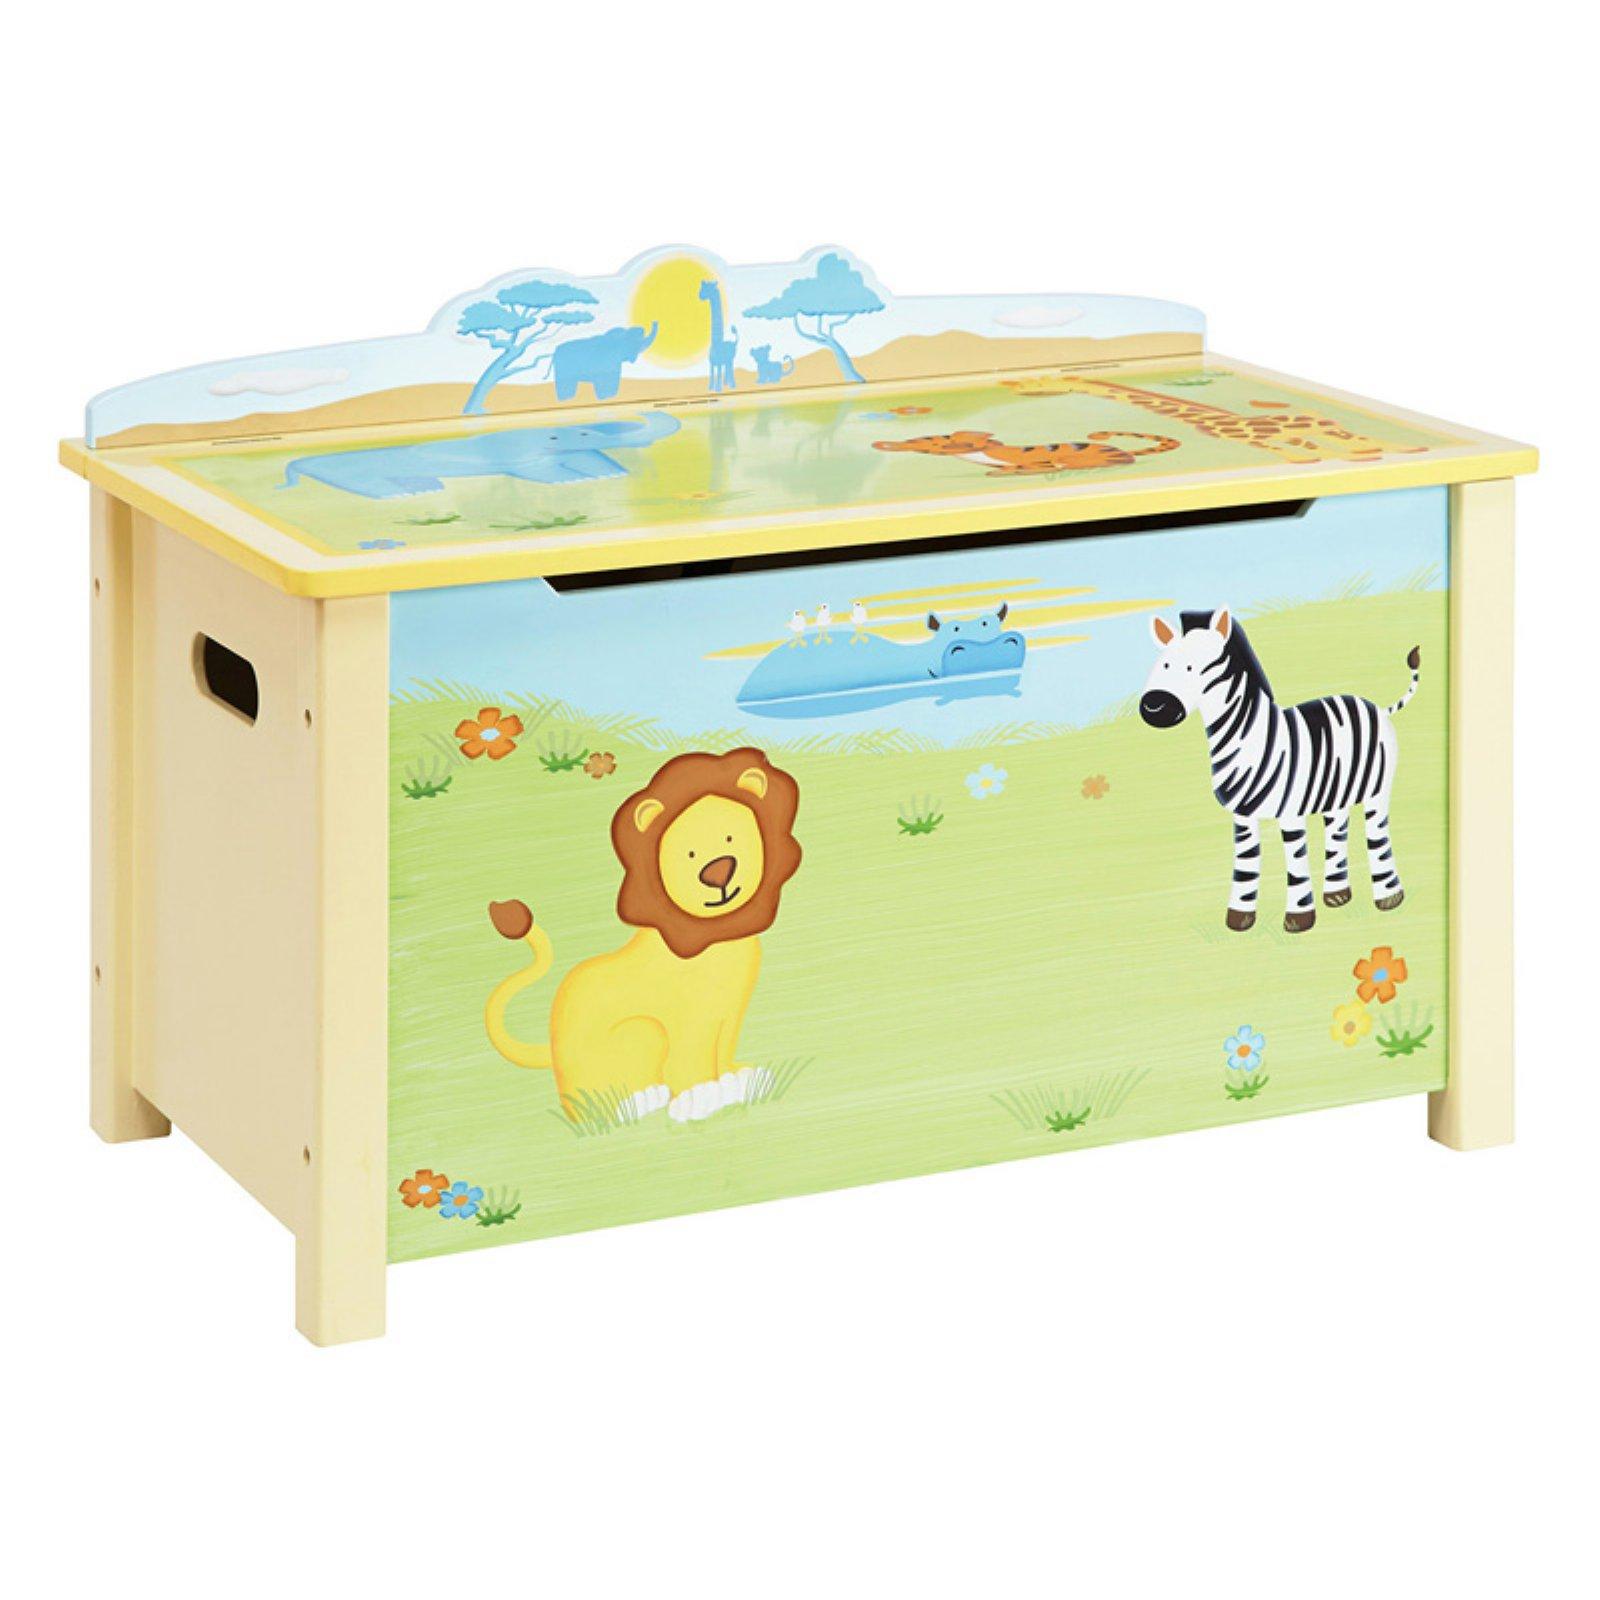 Guidecraft Savanna Smiles Toy Box, Green